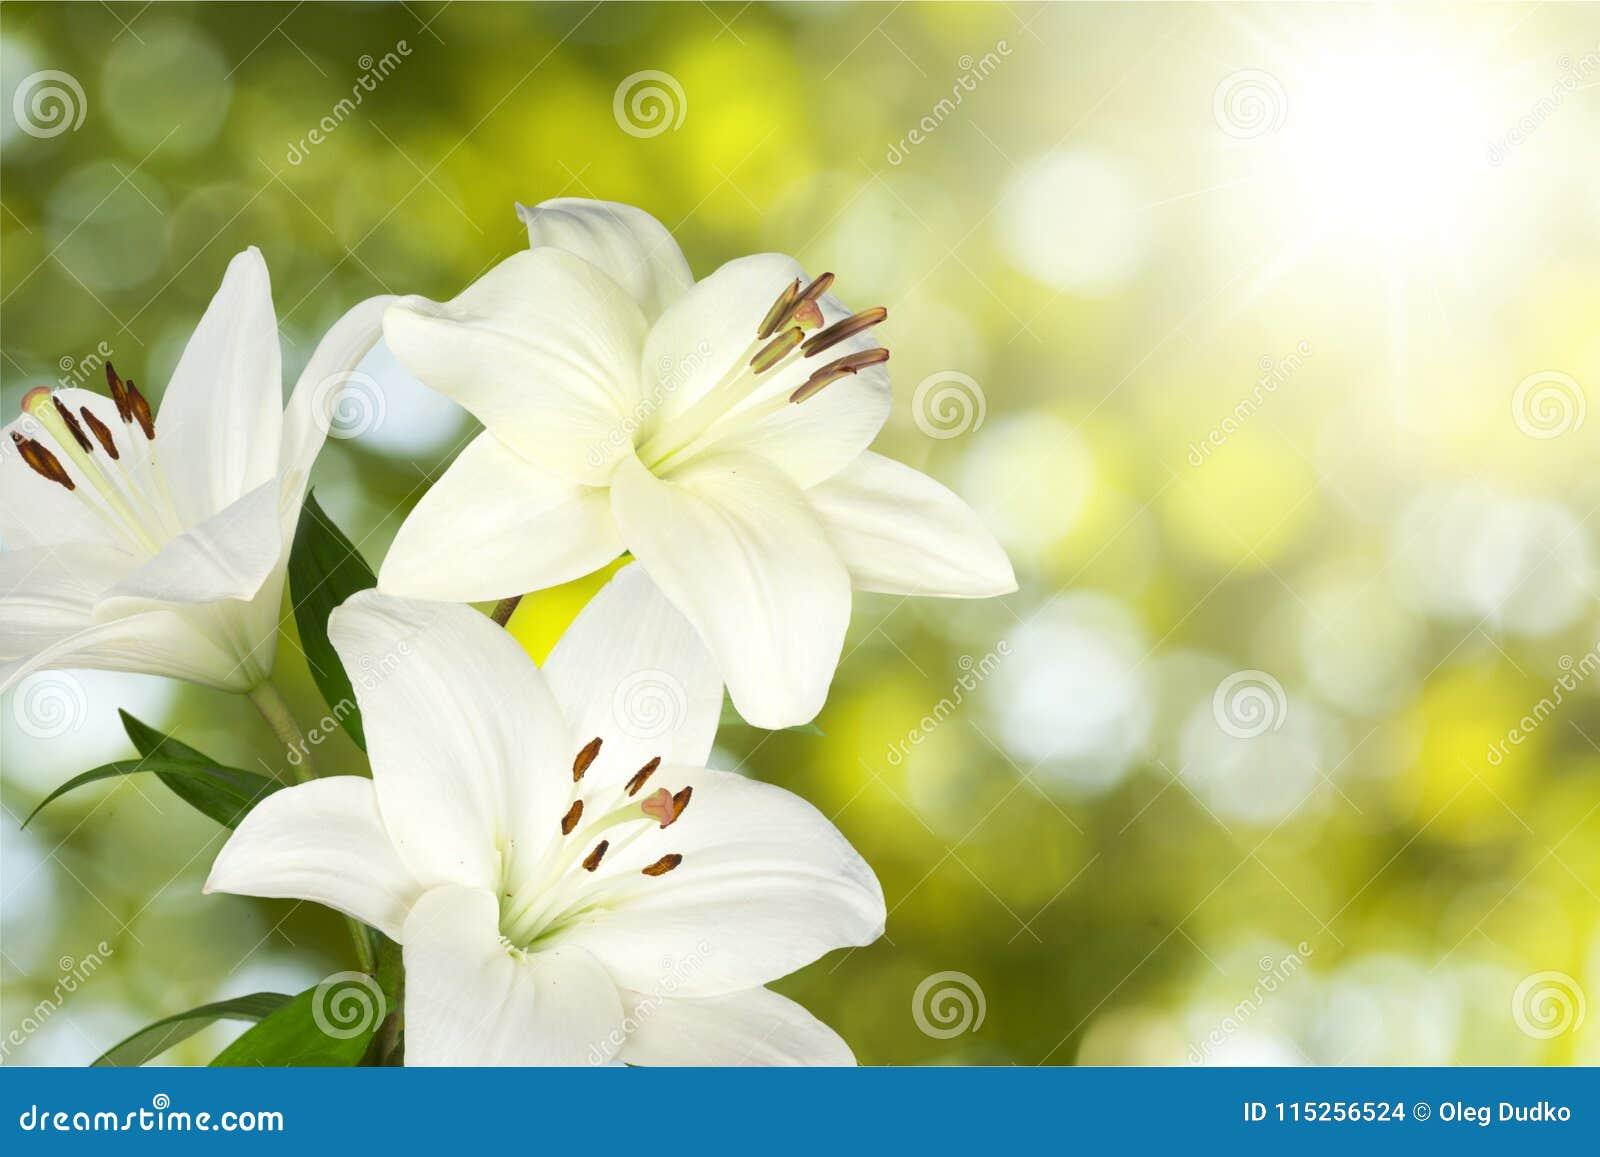 Flower stock photo image of white spring beauty lily 115256524 download flower stock photo image of white spring beauty lily 115256524 izmirmasajfo